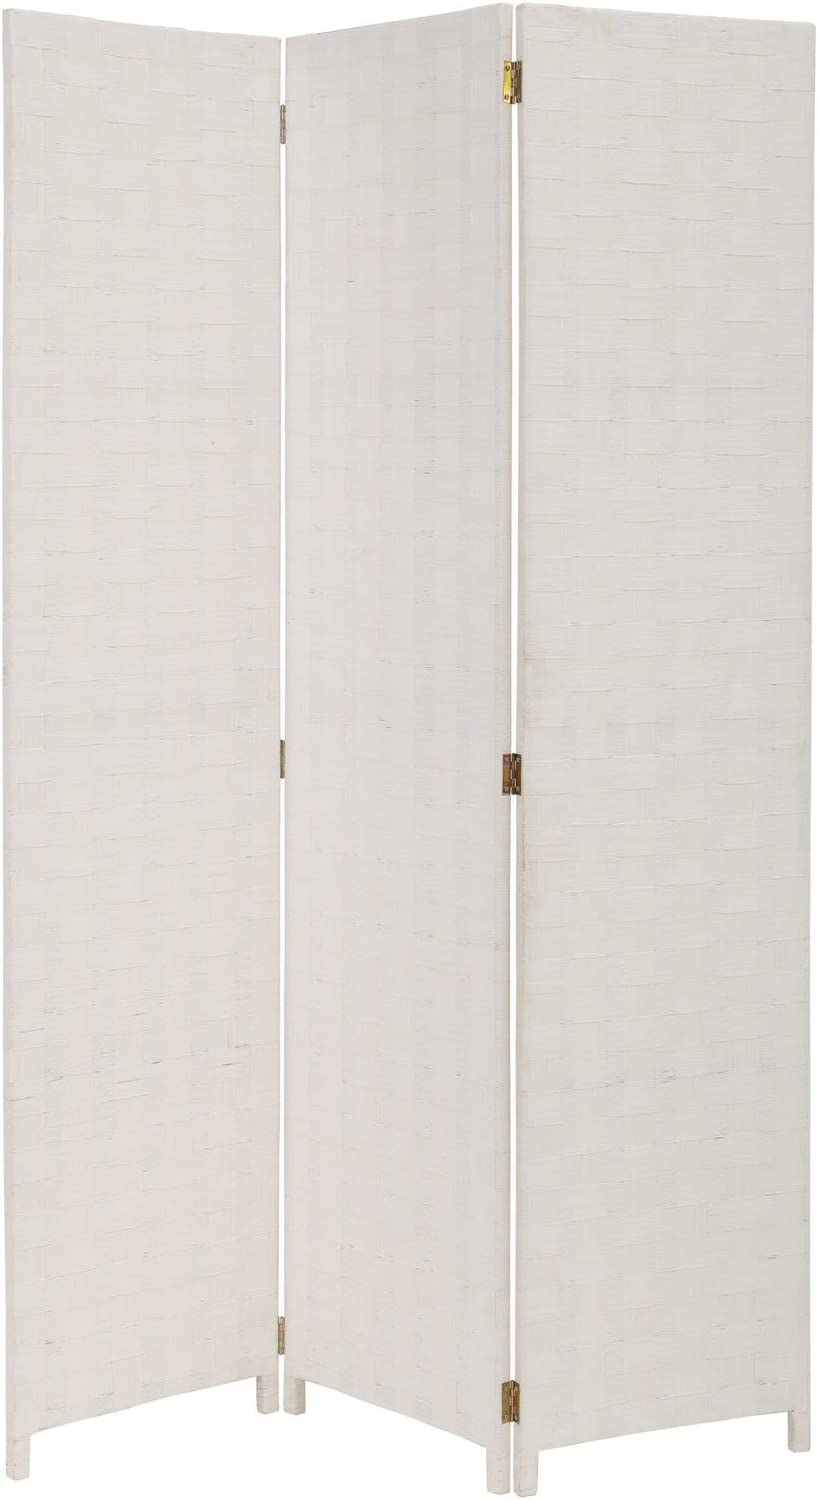 Biombo Plegable Oriental Blanco de Madera para salón Vitta - LOLAhome